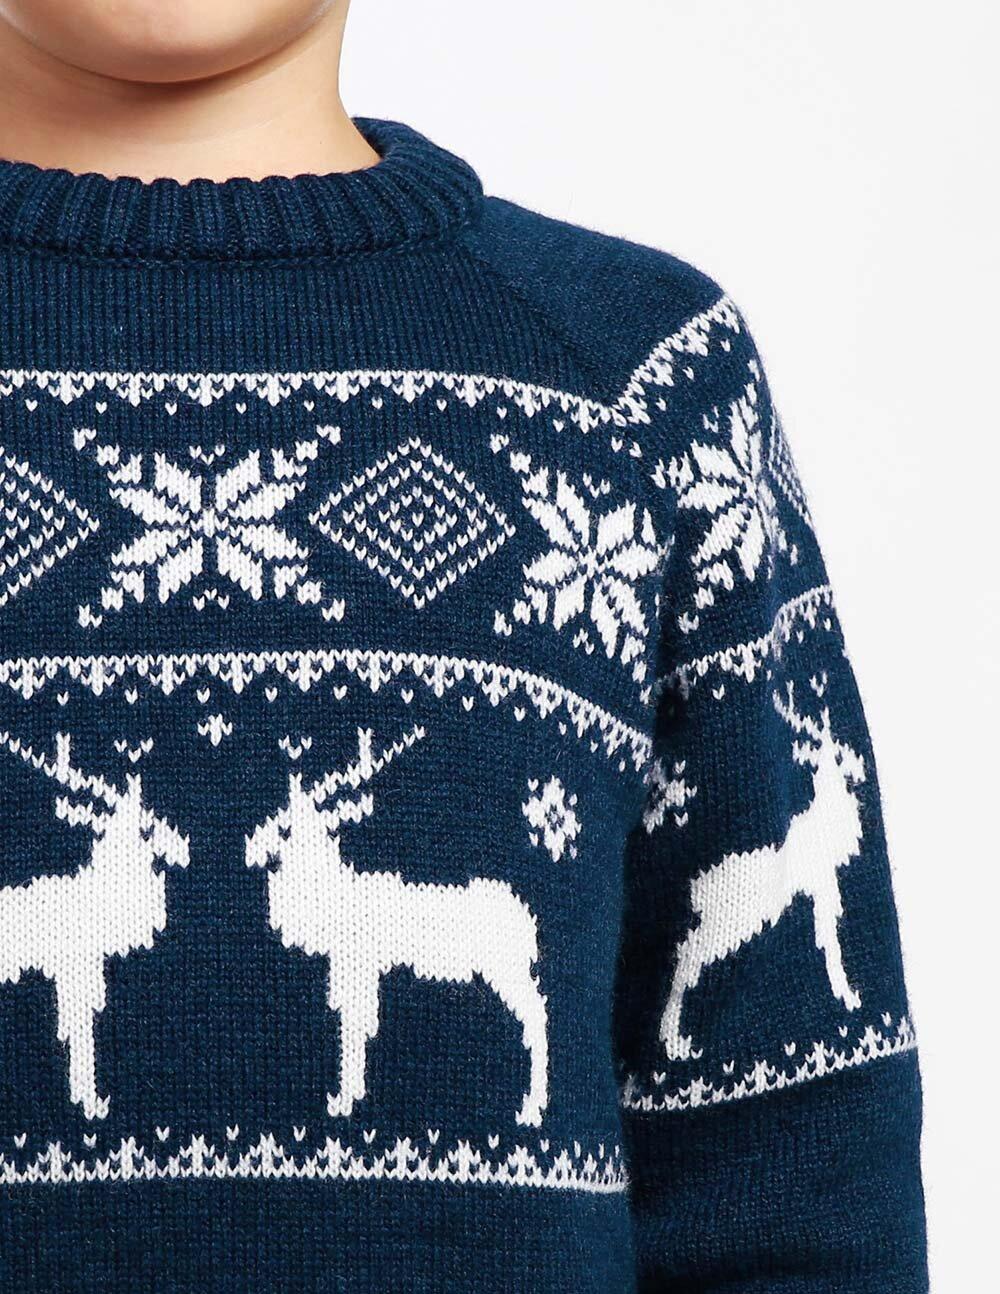 картинки на свитер с оленемер советуем